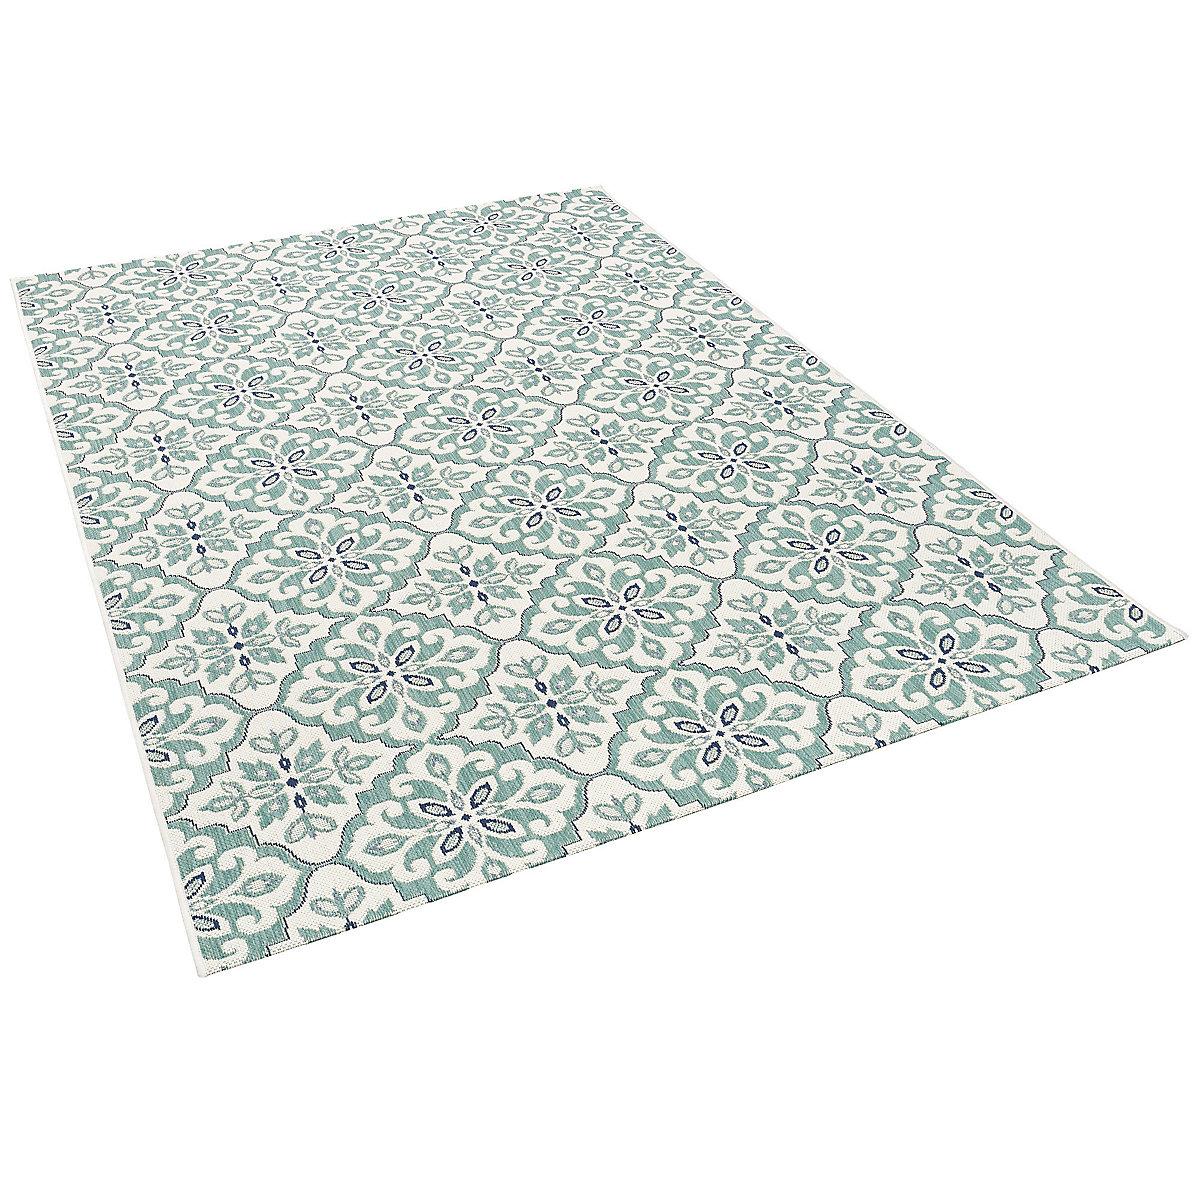 in outdoor teppich carpetto fliesenoptik gr n yomonda. Black Bedroom Furniture Sets. Home Design Ideas